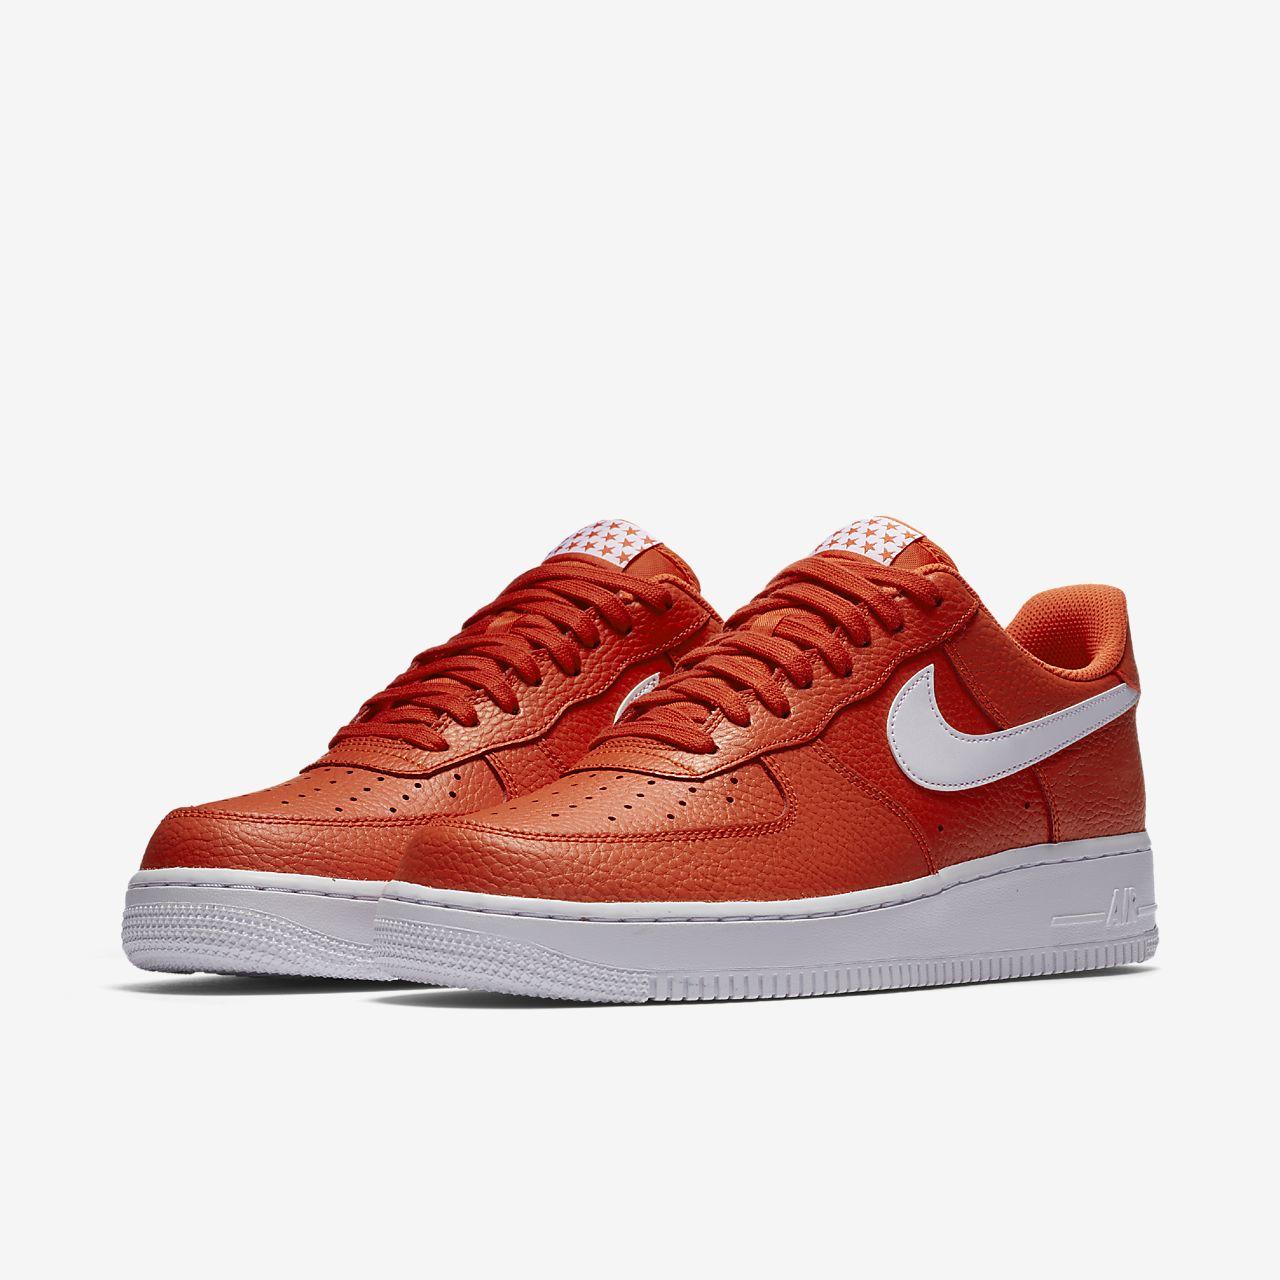 on sale fc354 76ab4 Low Resolution Calzado para hombre Nike Air Force 1 07 Calzado para hombre  Nike Air Force 1 07